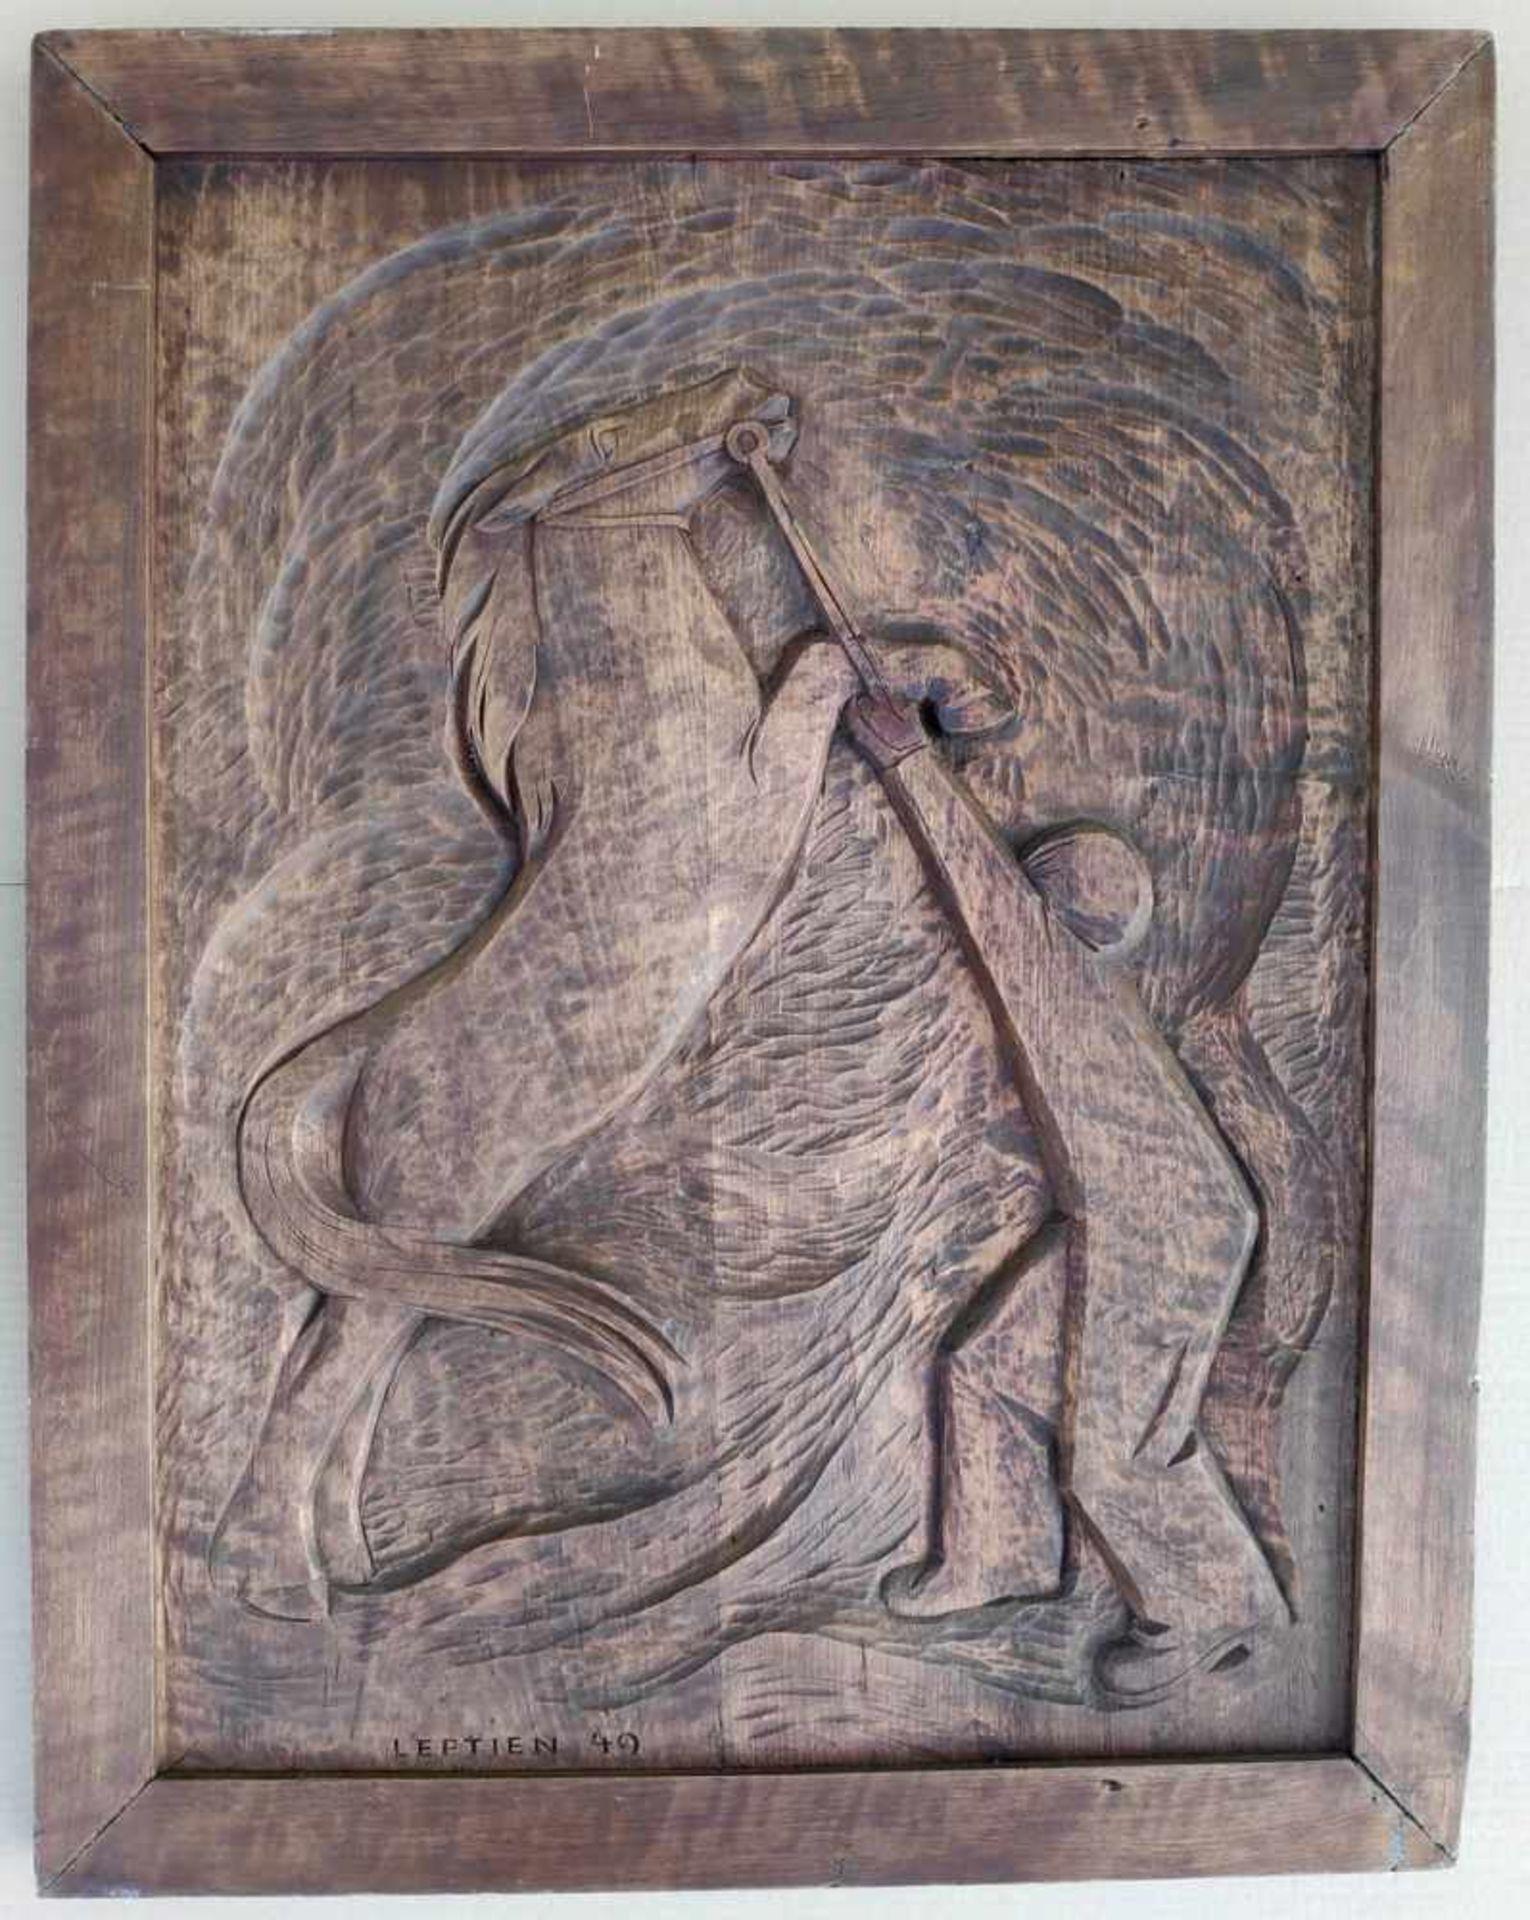 Leptien, Rudolf (1907 Kiel -1977 Iggensbach)